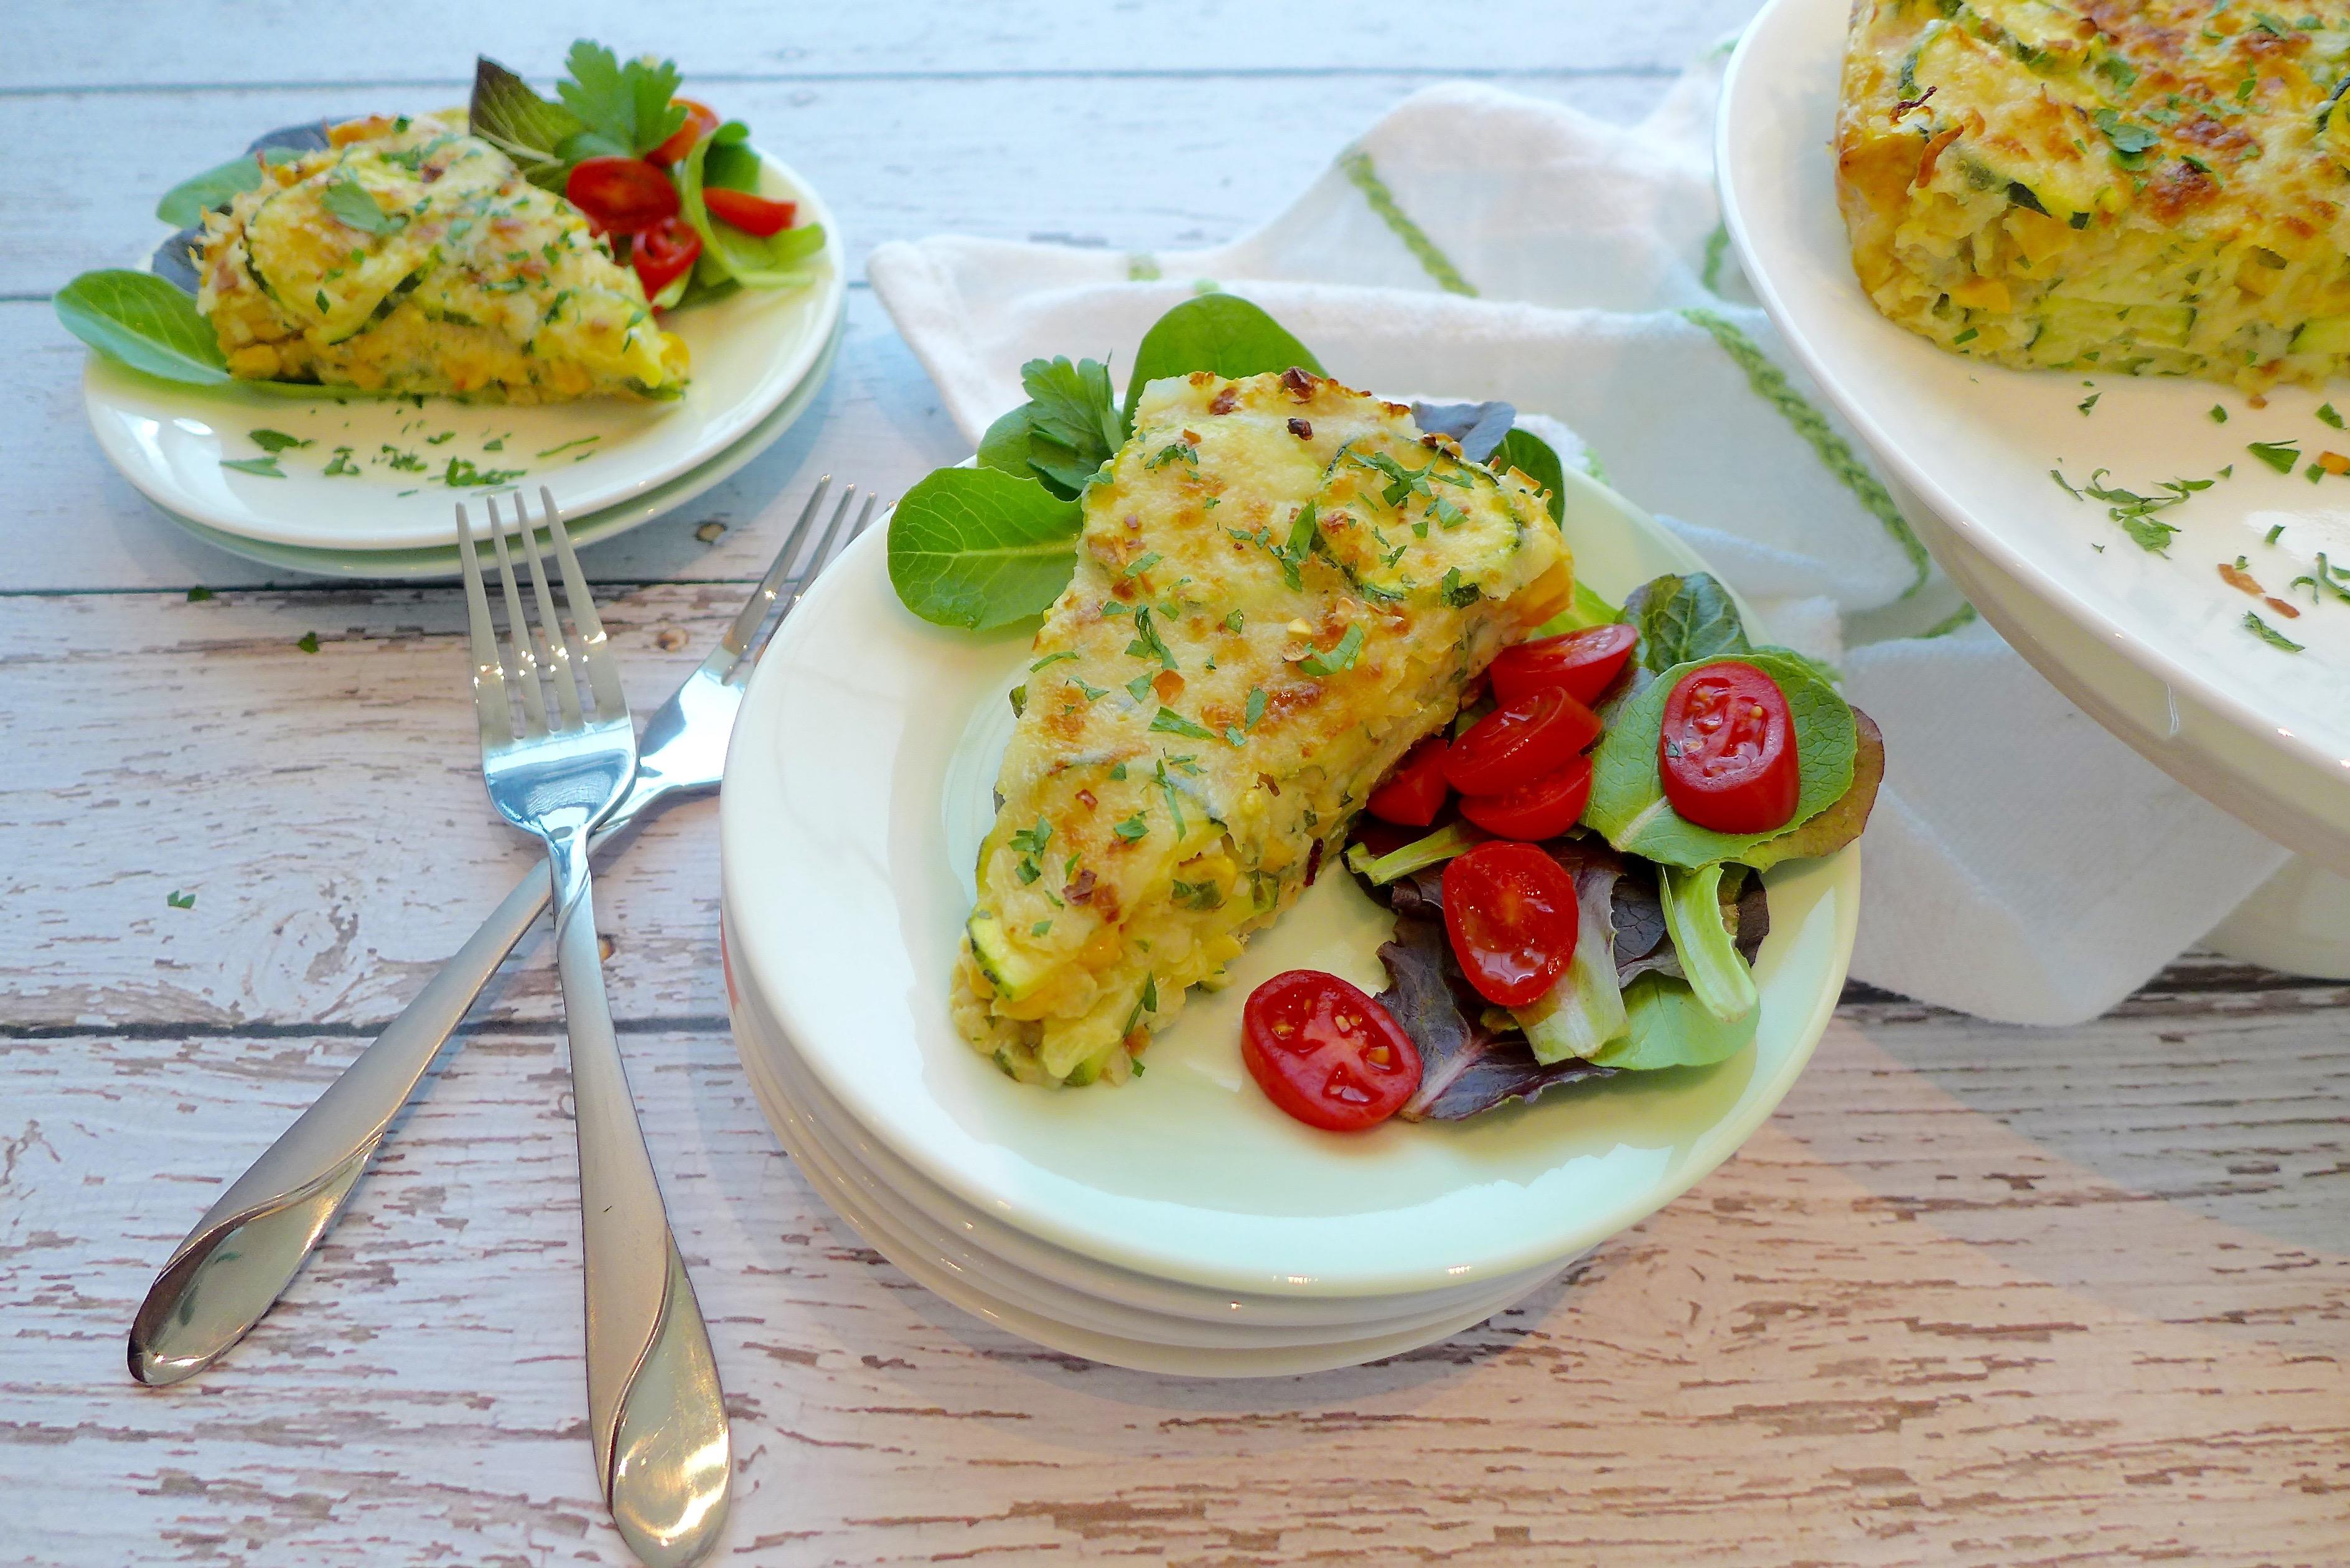 Savory Zuchinni Pie Slice with salad